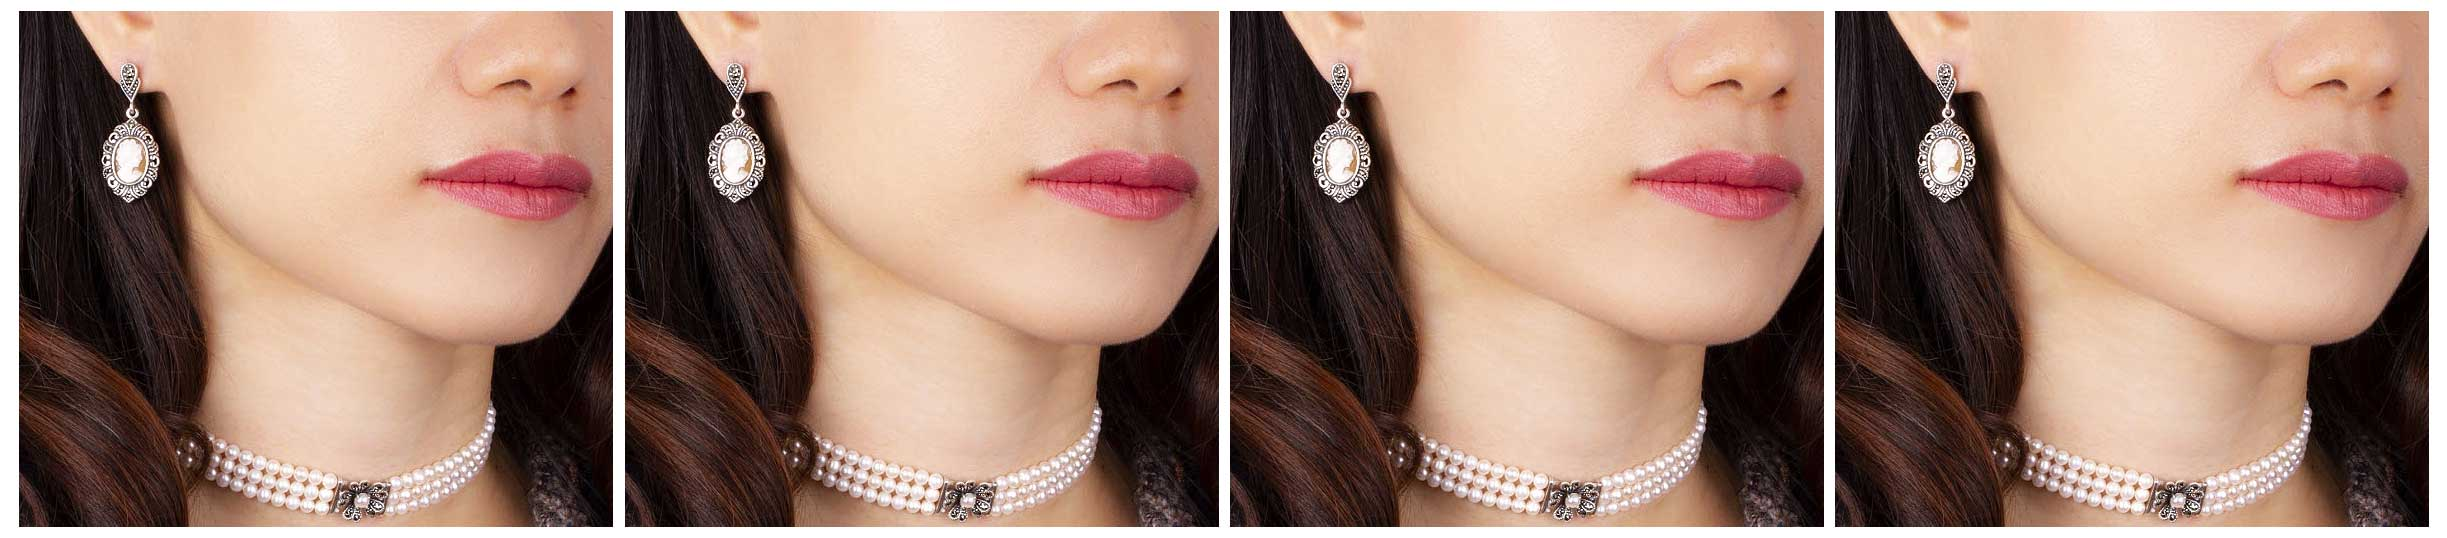 Winter Jewelry Trend 2019 003